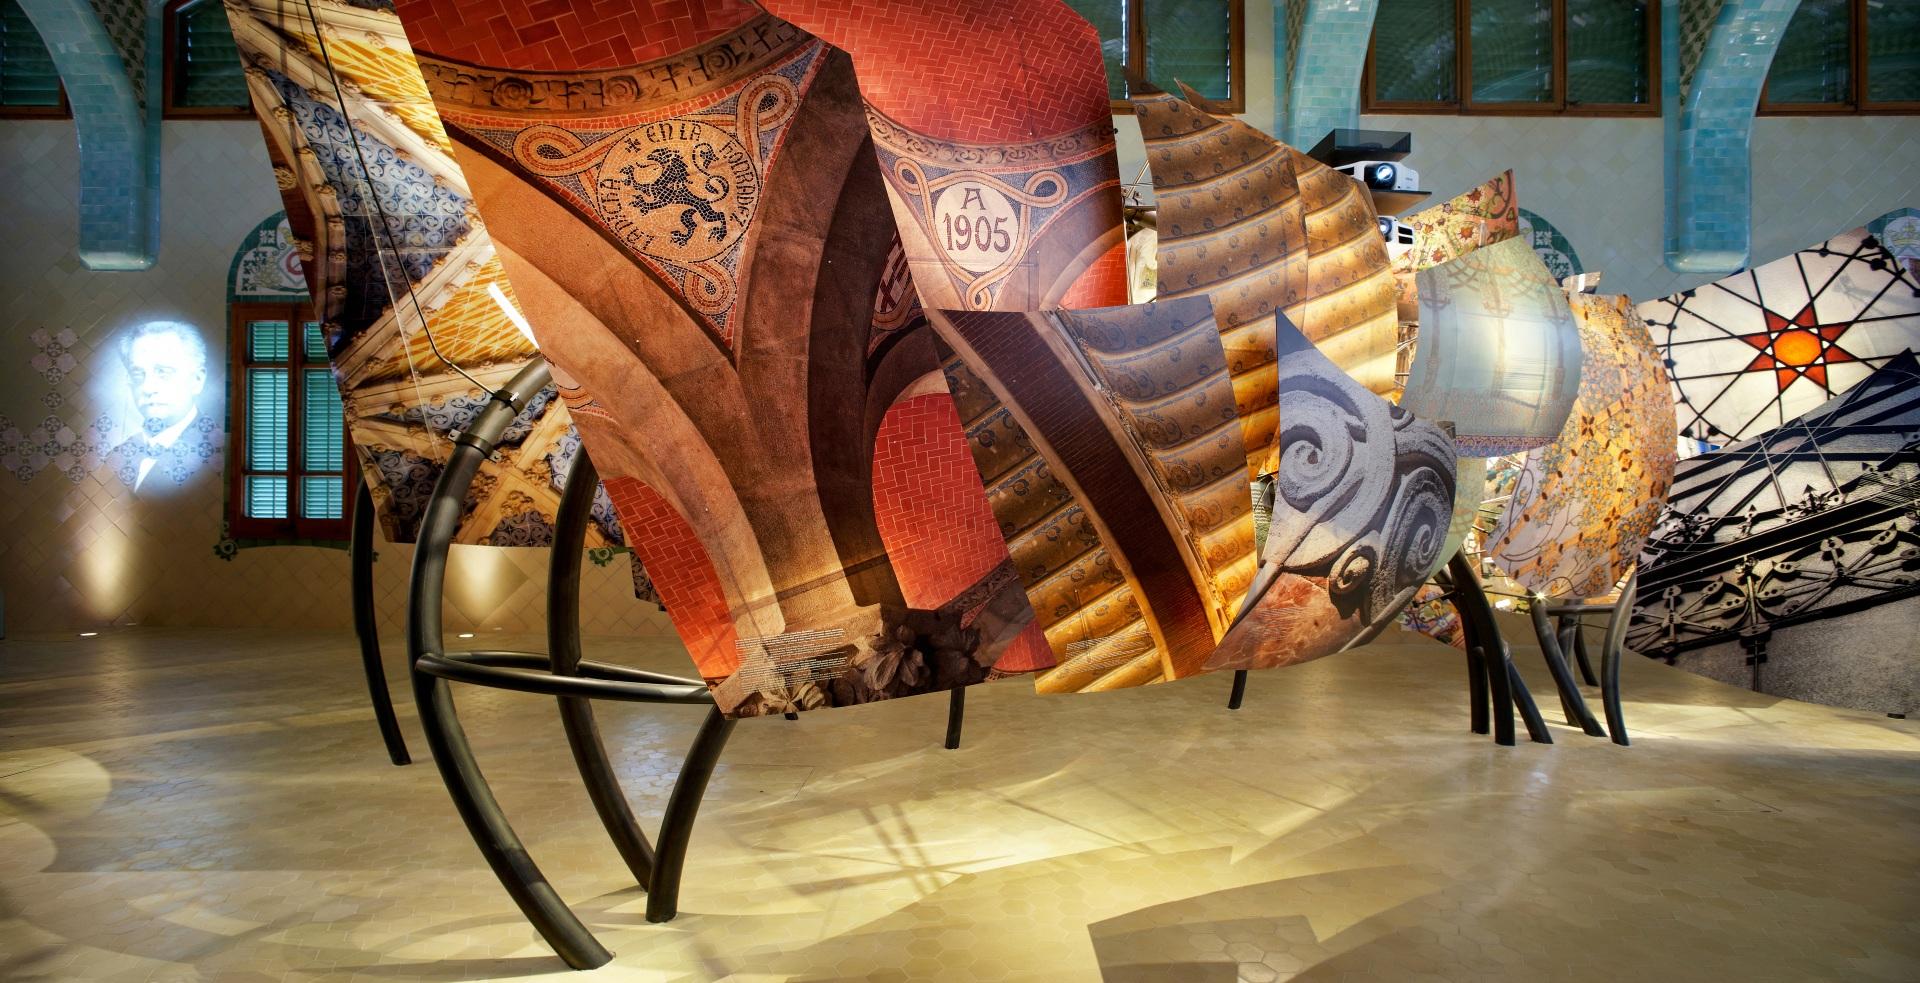 Hospital of the Santa Creu i Sant Pau. Illuminated dragon made of architectonic elements by Domènech i Montaner.